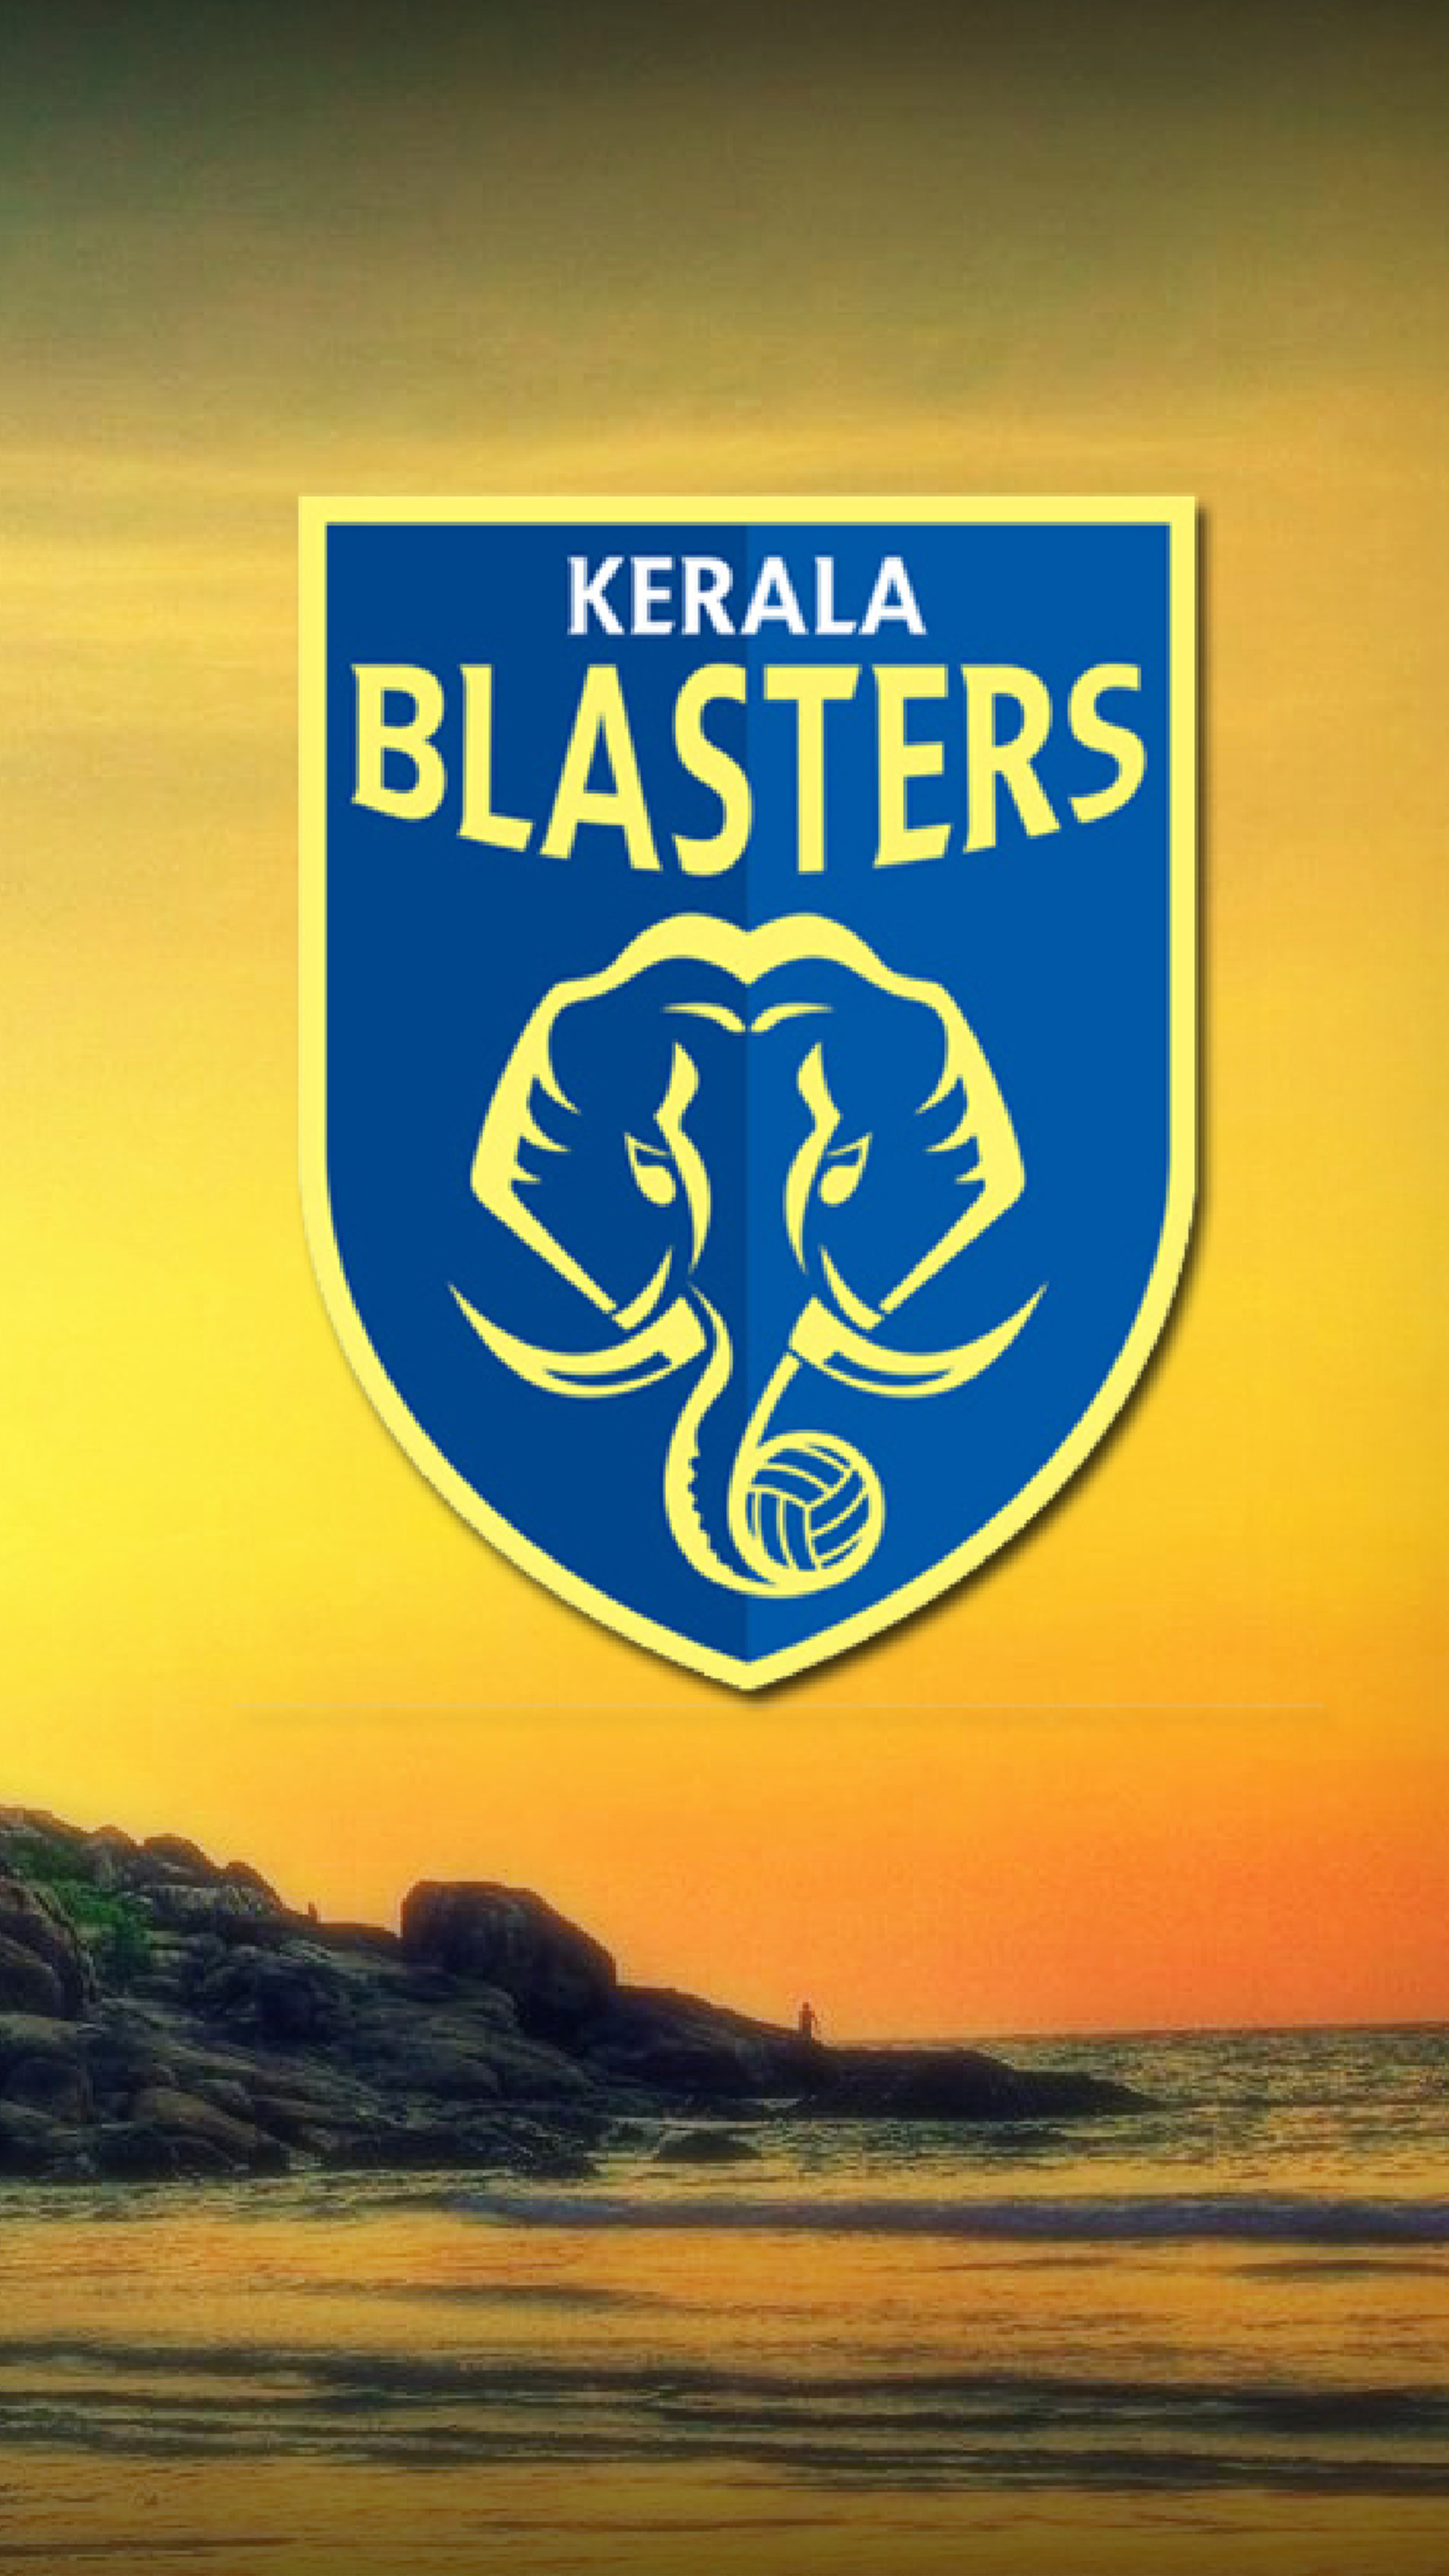 Kerala Blasters   Download HD Mobile Wallpapers 2160x3840